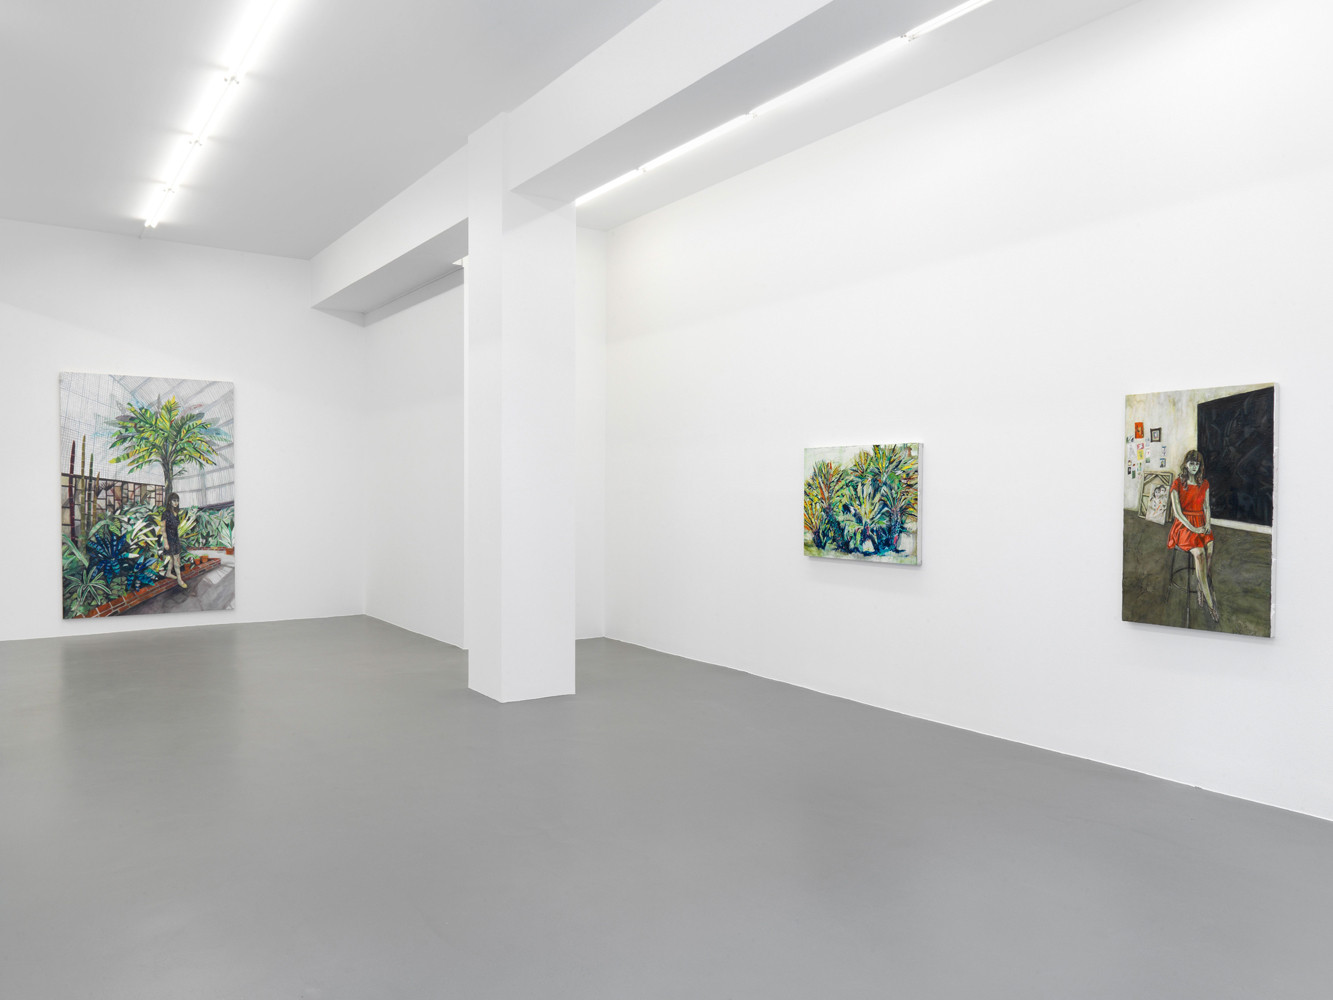 Raffi Kalenderian, 'Paint Work', Installation view, Buchmann Galerie, 2013